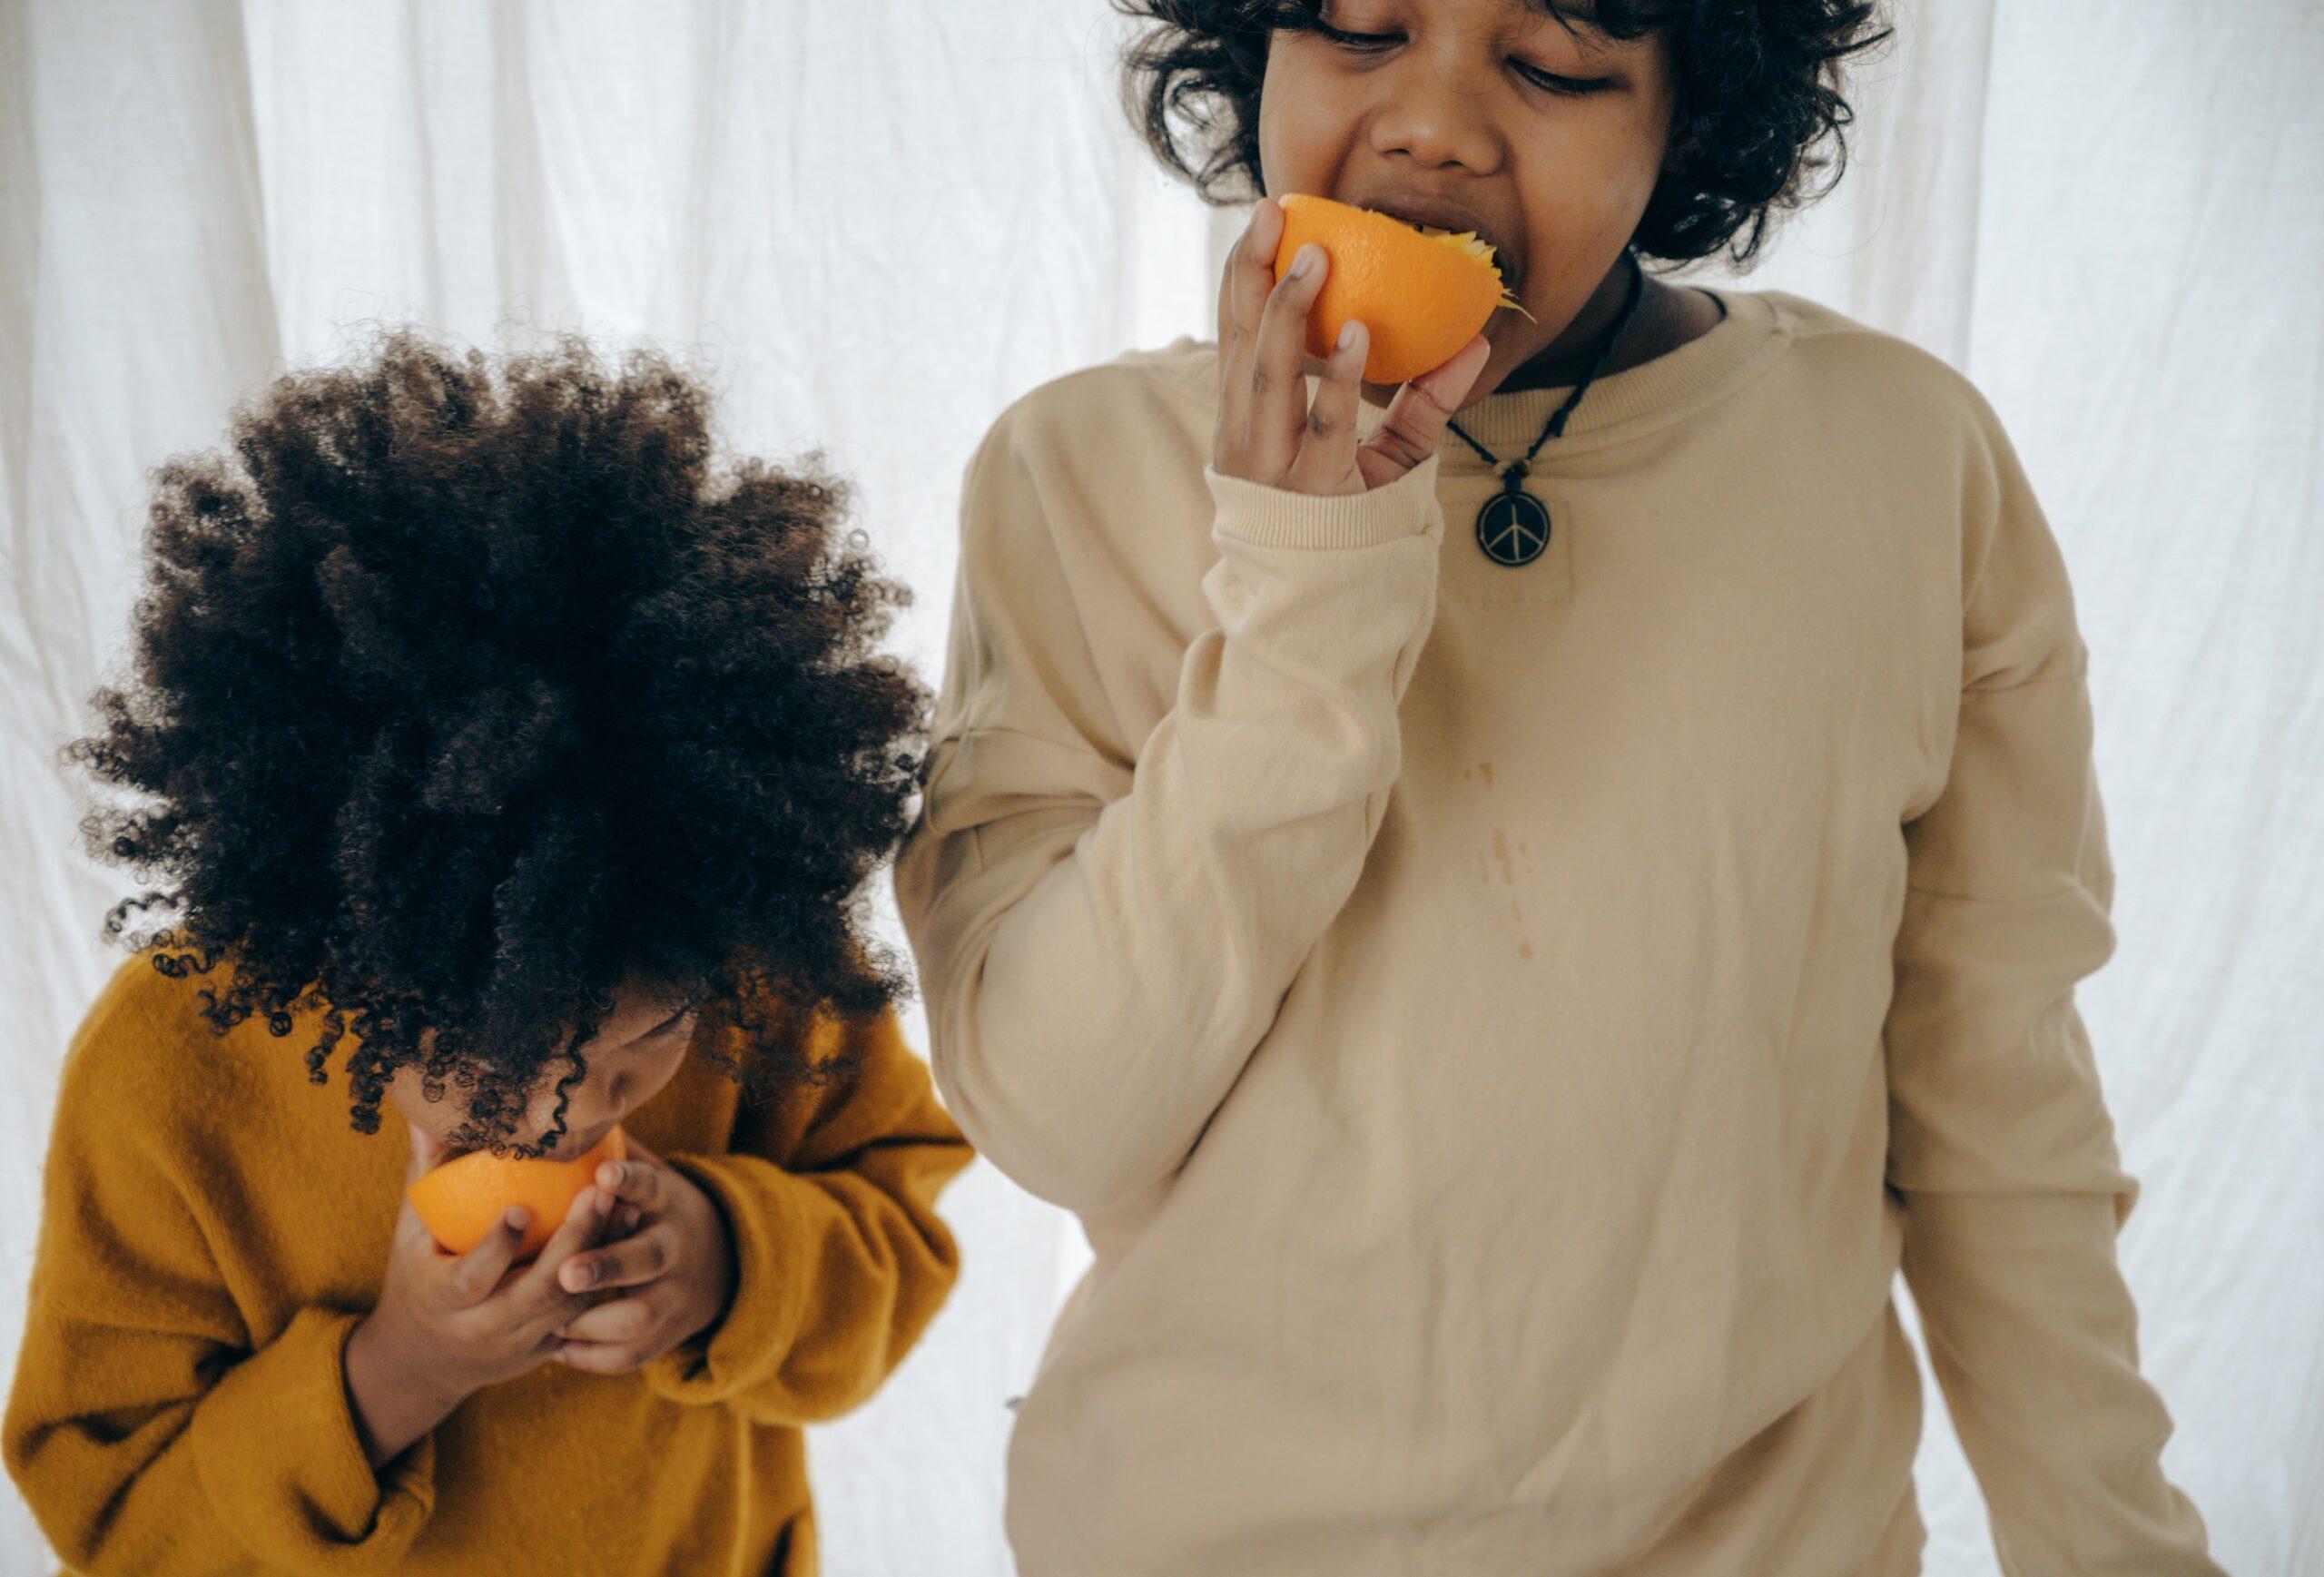 oranges, kids eating, child food, nutrition, Ketut Subiyanto